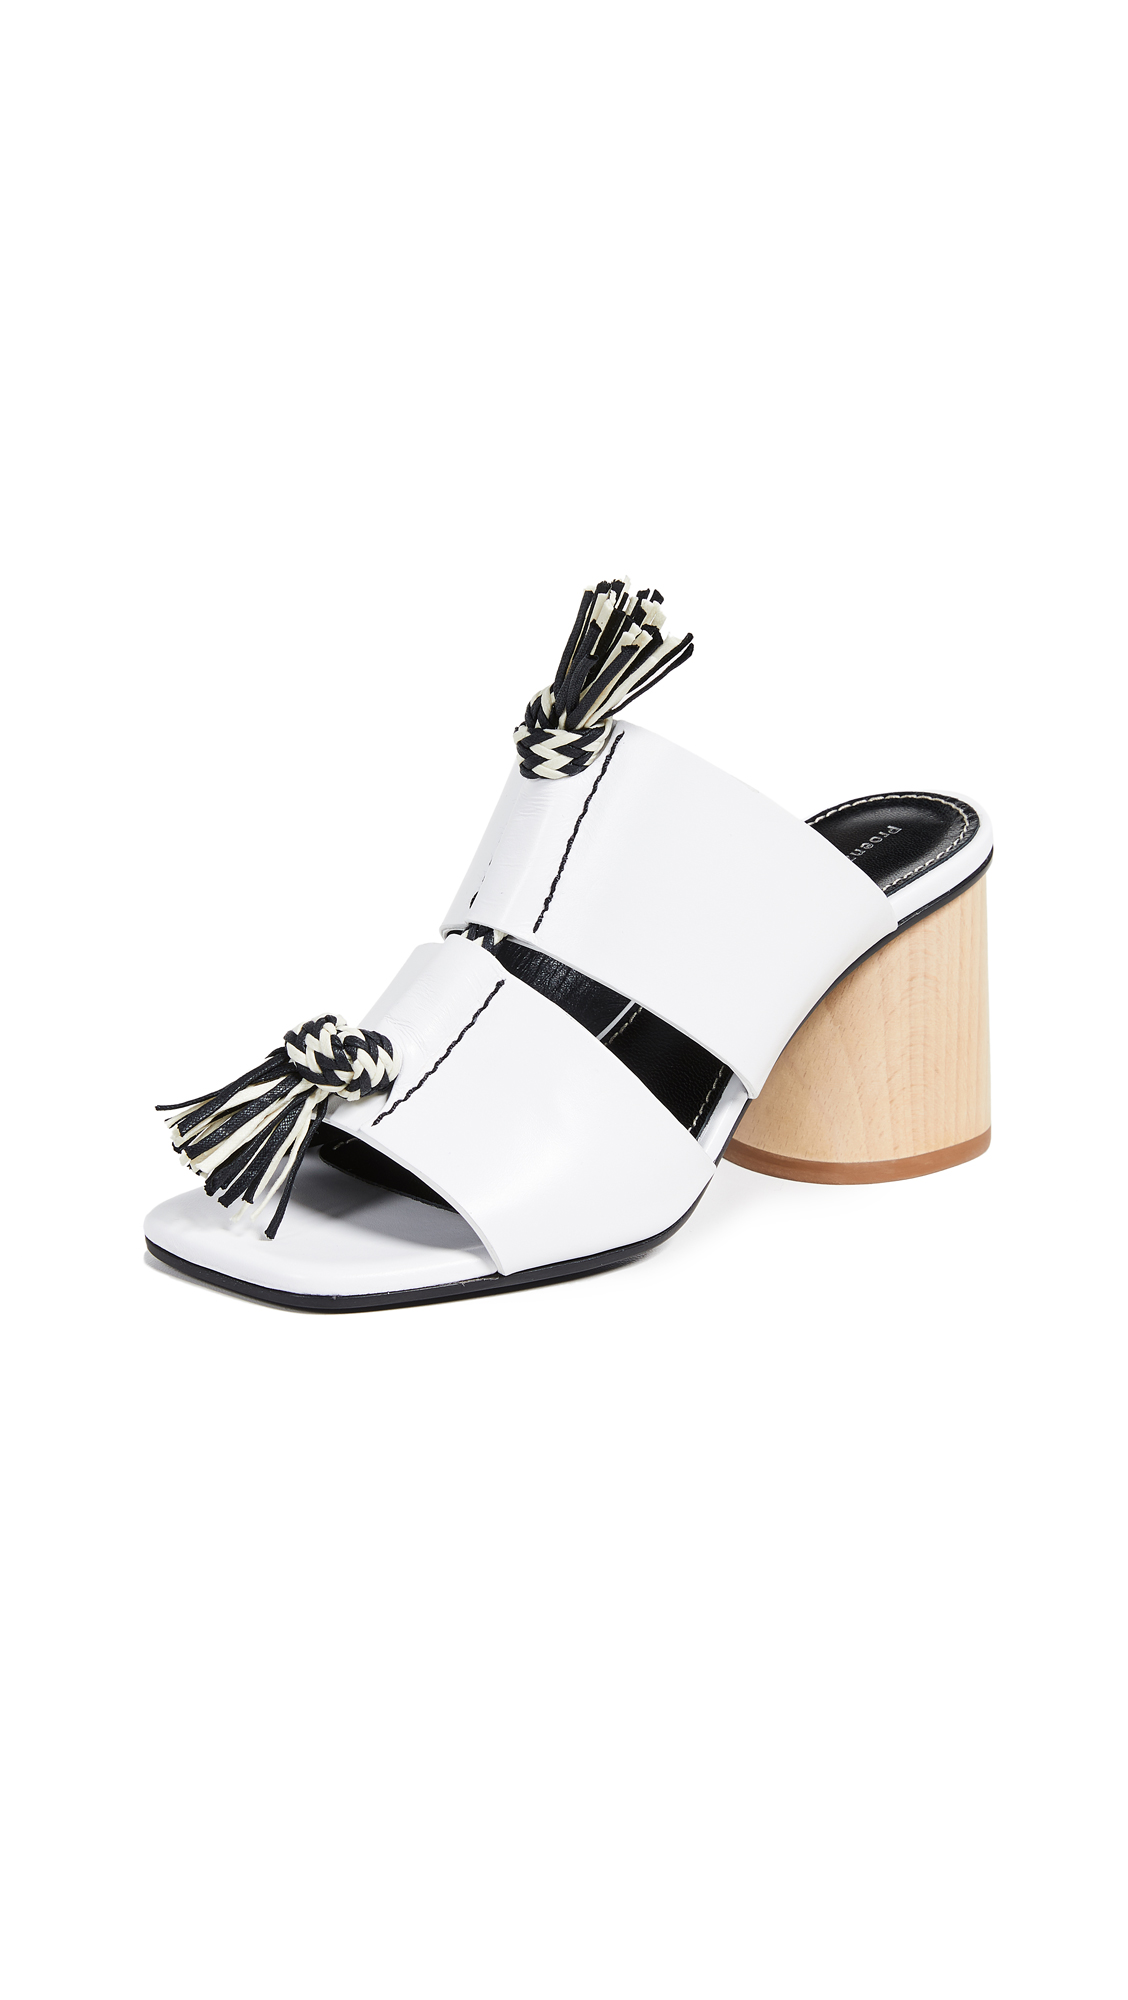 Proenza Schouler Rope Mules - White/White/Black